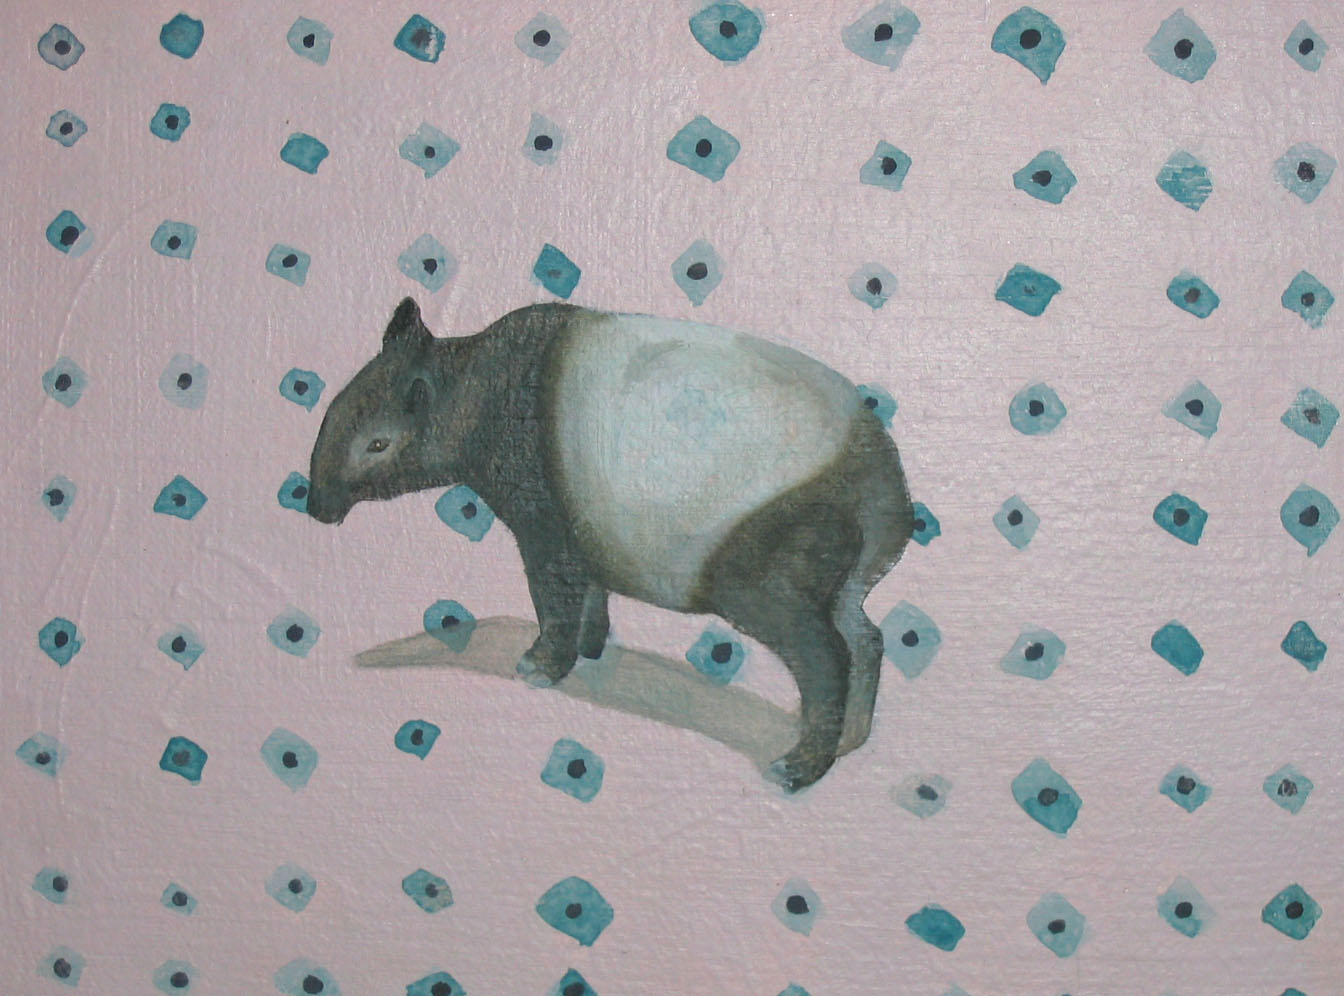 http://3.bp.blogspot.com/_RzAt0NvaY2k/S9lemvrJ0fI/AAAAAAAAAJY/obzPJzMvqo8/s1600/tapir_pattern.jpg